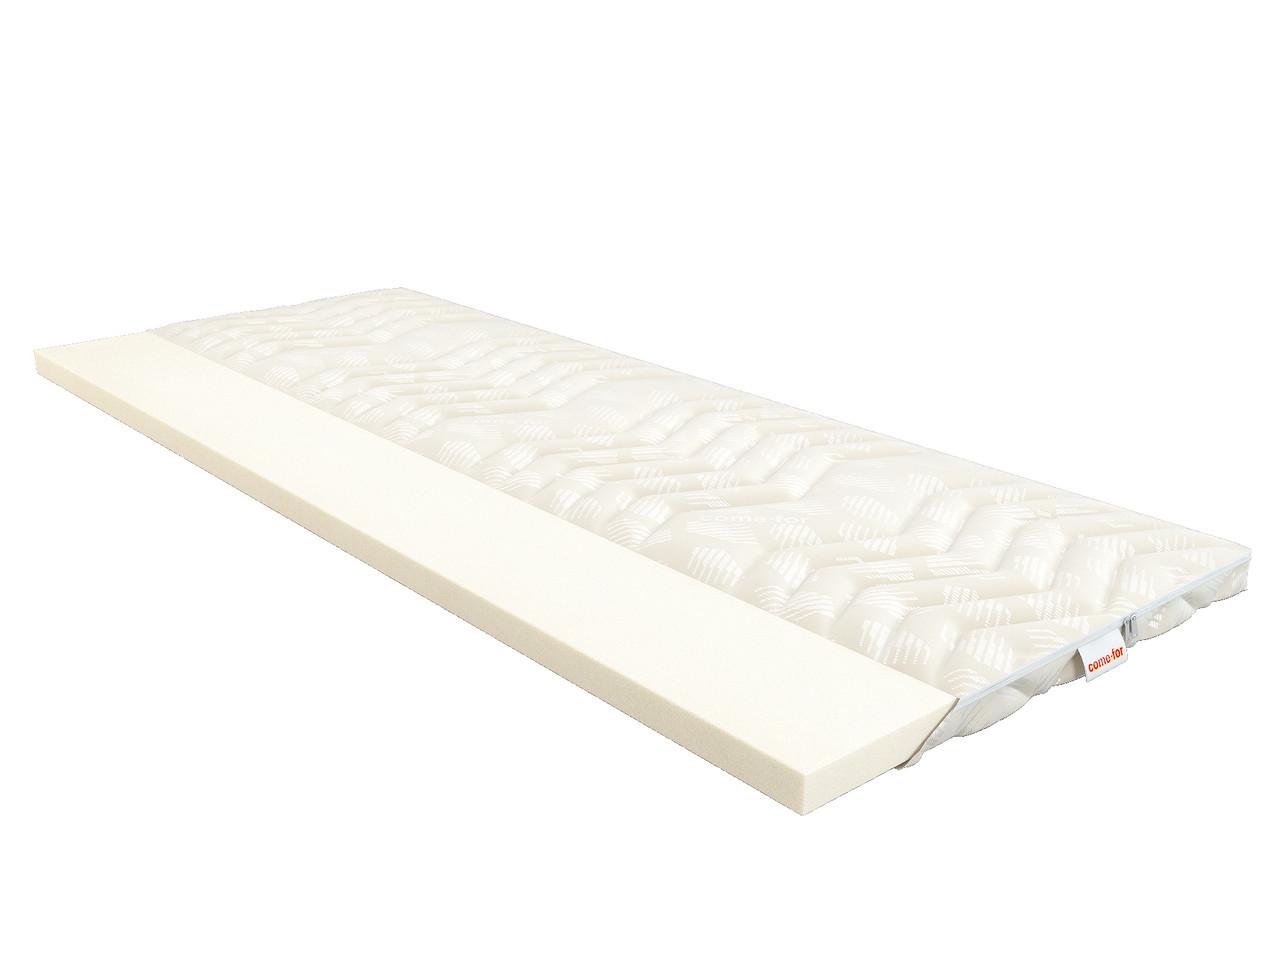 Тонкий матрас для диванов(Футон) Спайс актуальная цена!!! 90*200